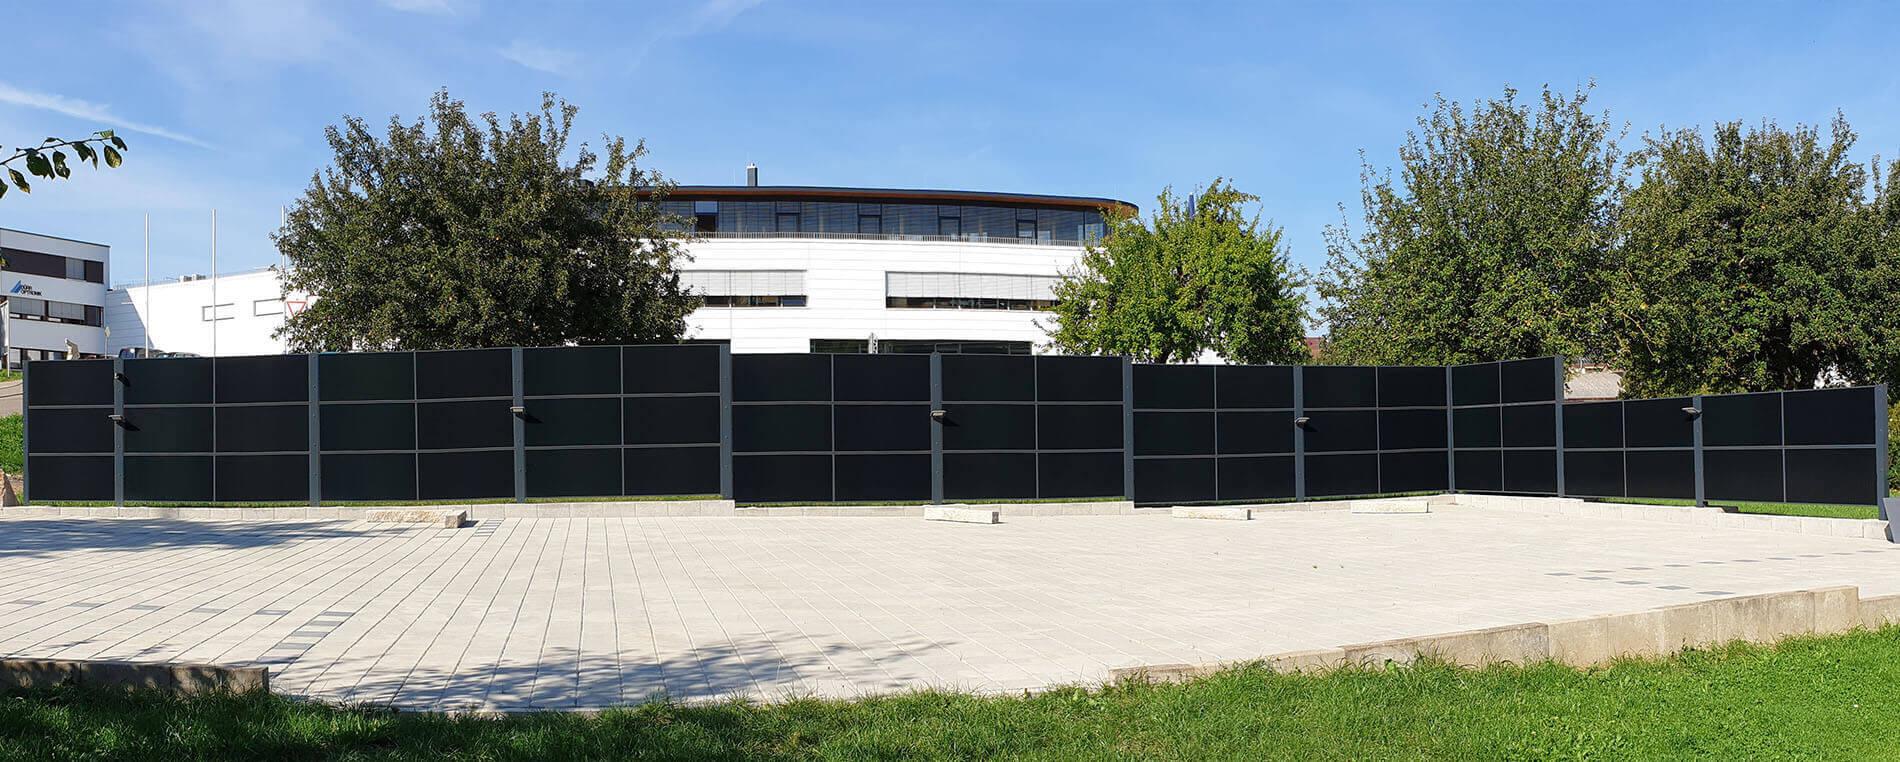 SolarZaun Referenz im Gewerbegebiet in Gechingen